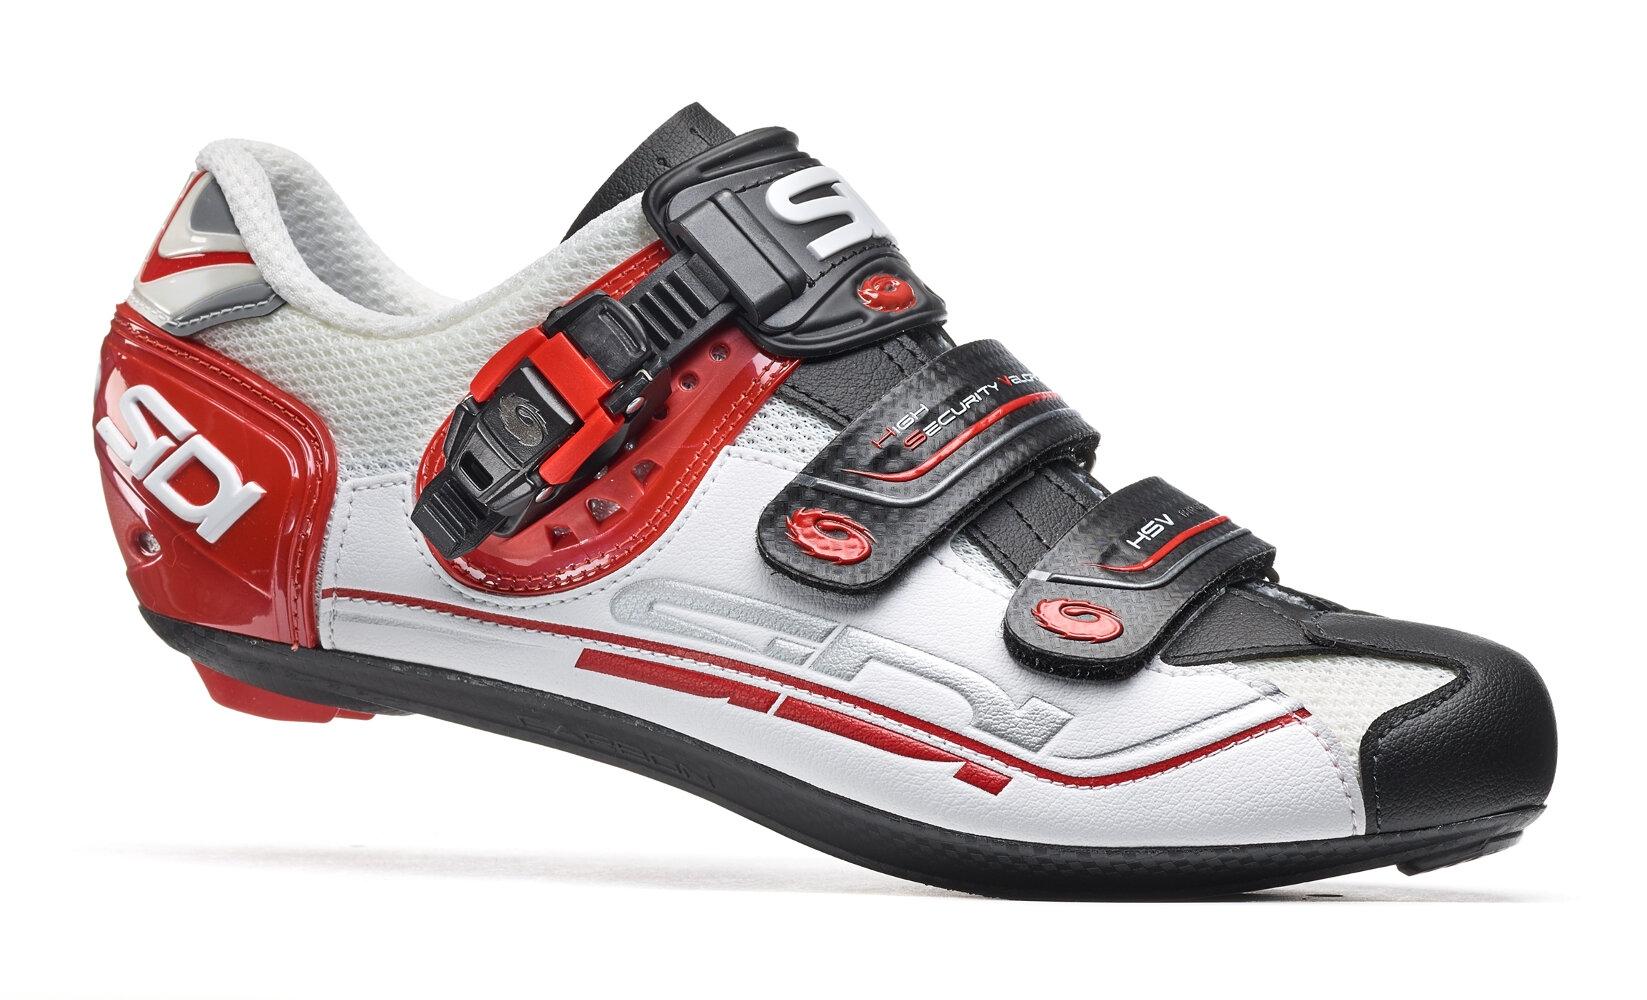 Chaussures Sidi GENIUS 7 Blanc/Noir/Rouge - 43